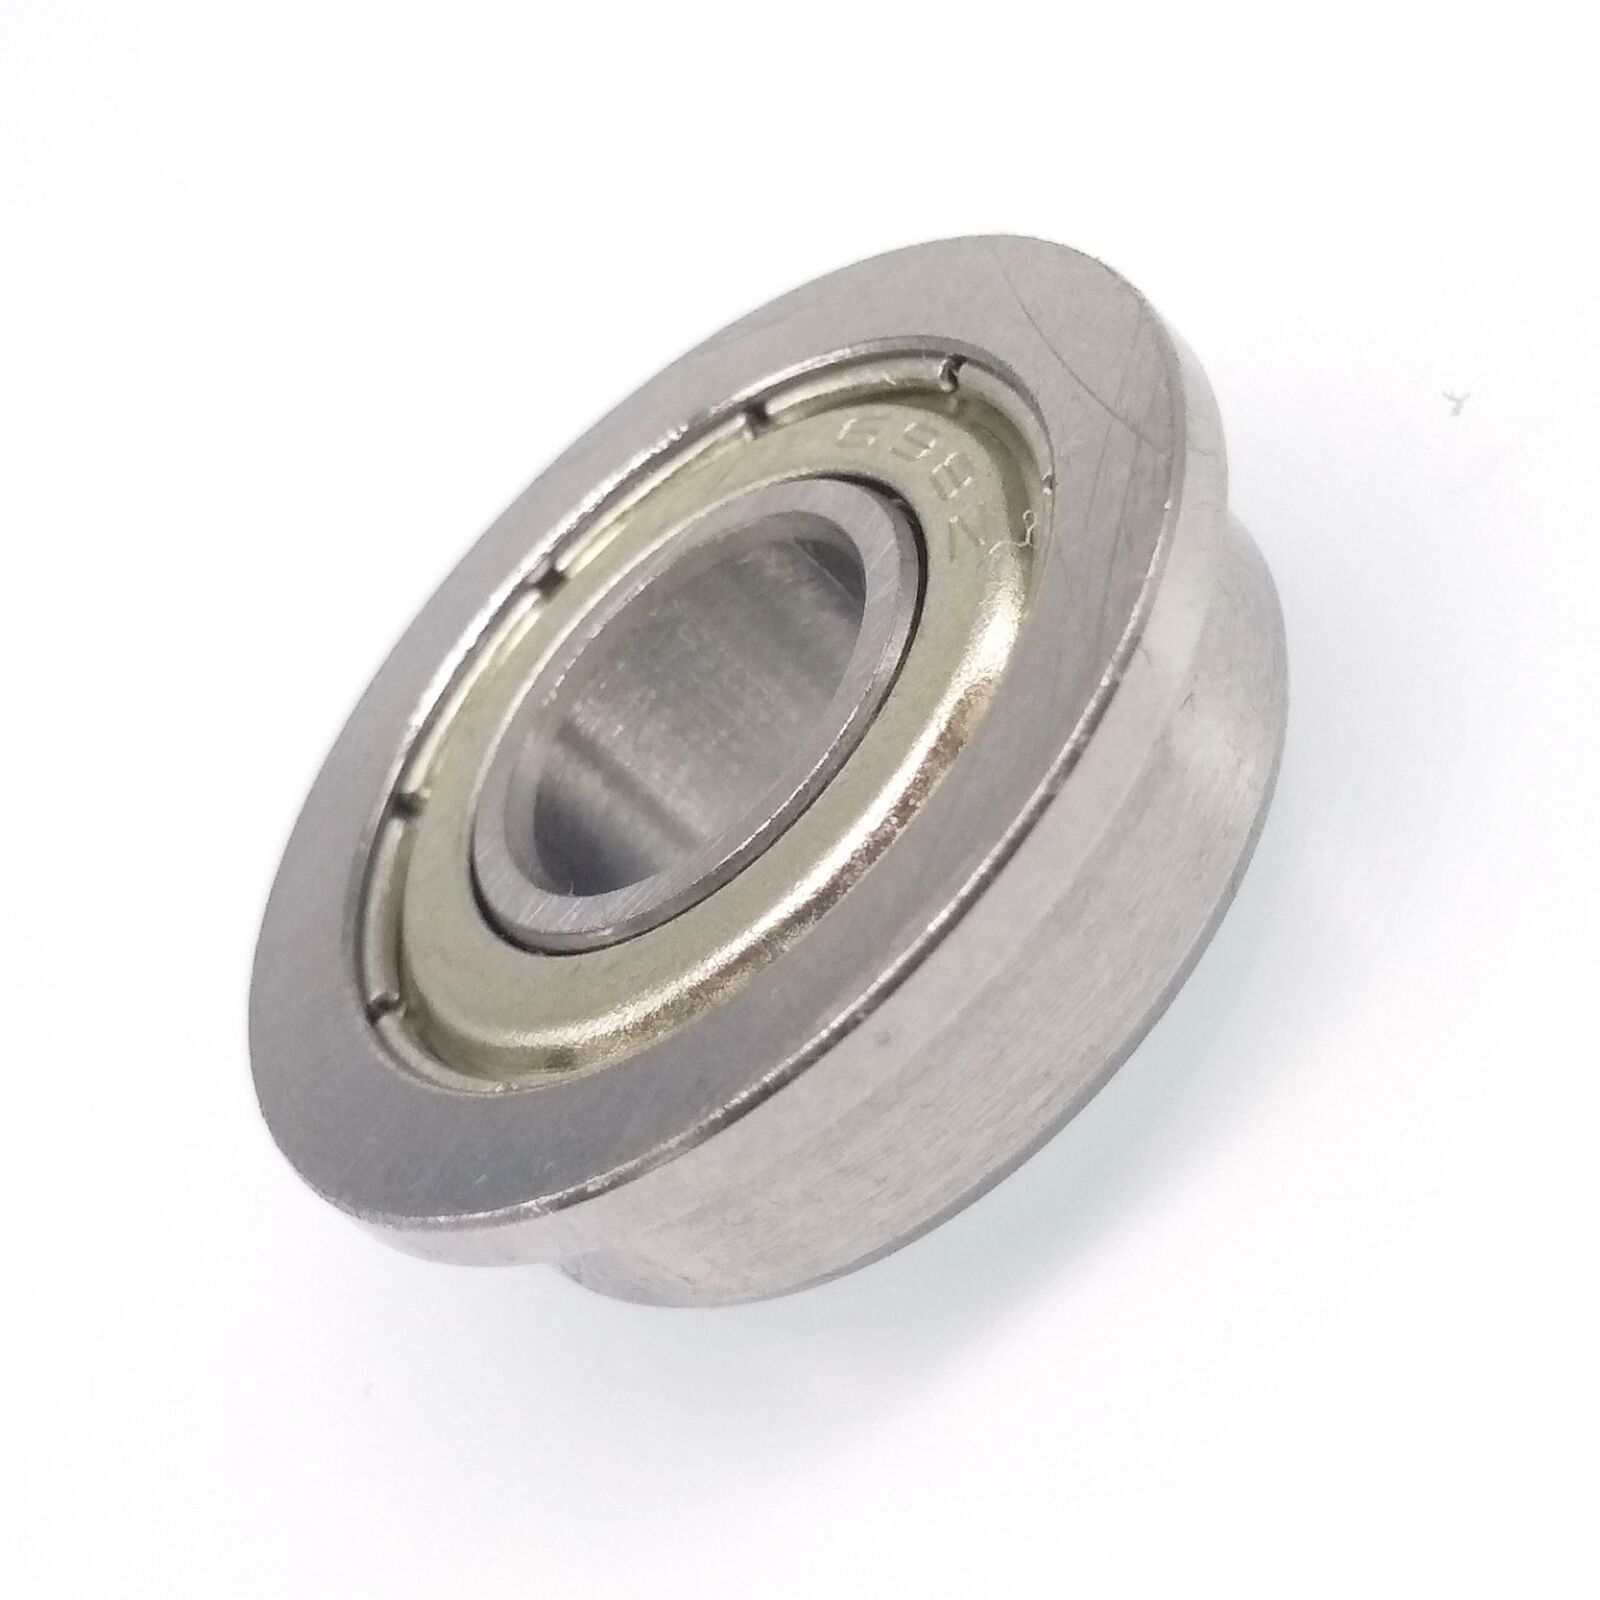 10pcs 698zz 8x19x6mm Open Miniature Bearings ball Mini Hand Bearing Spinner